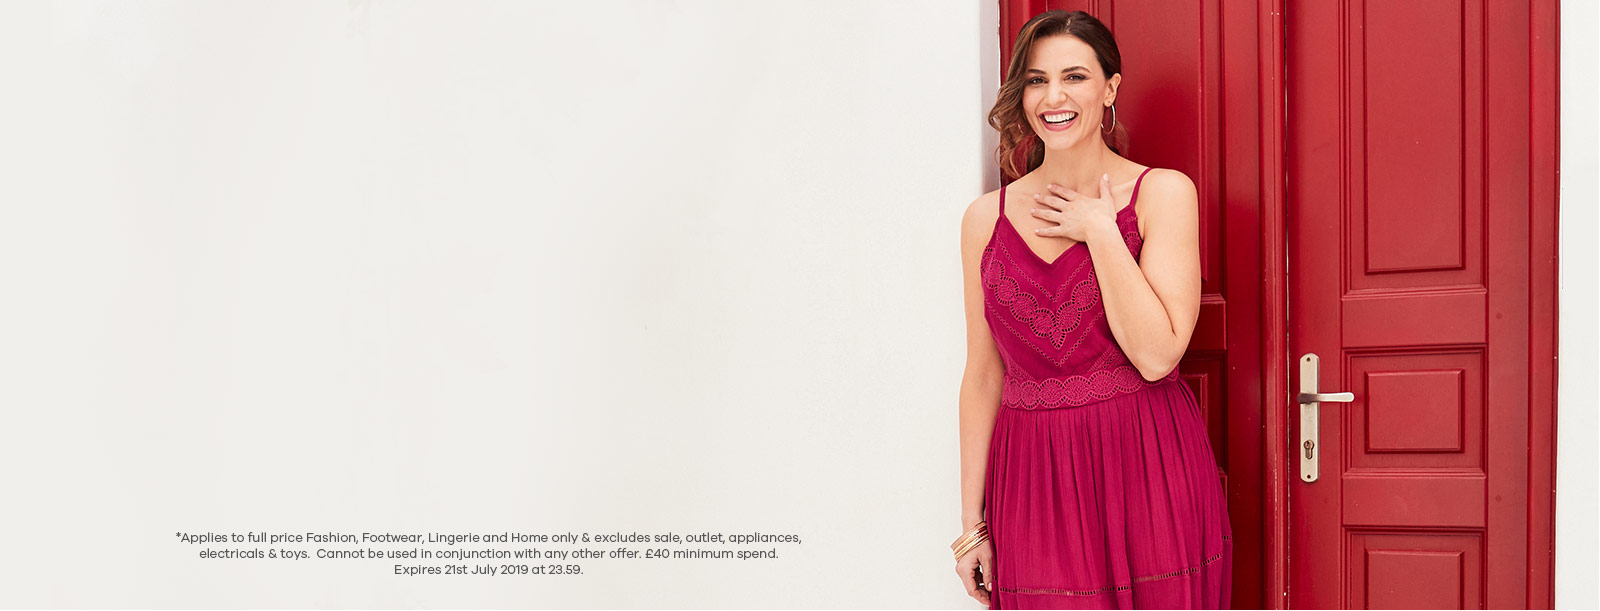 b039255e5ad33 Women's Fashion in Plus Size, menswear, furniture, homewares and ...